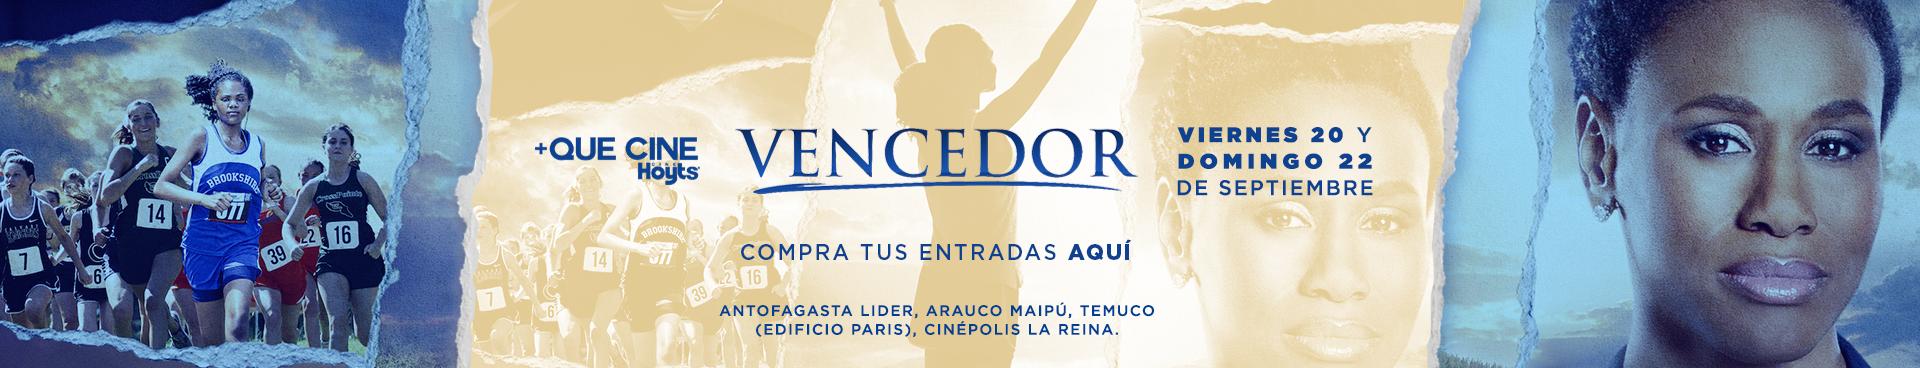 VENCEDOR ( ANTOFAGASTE LIDER - MAIPÚ- LA REINA Y TEMUCO)